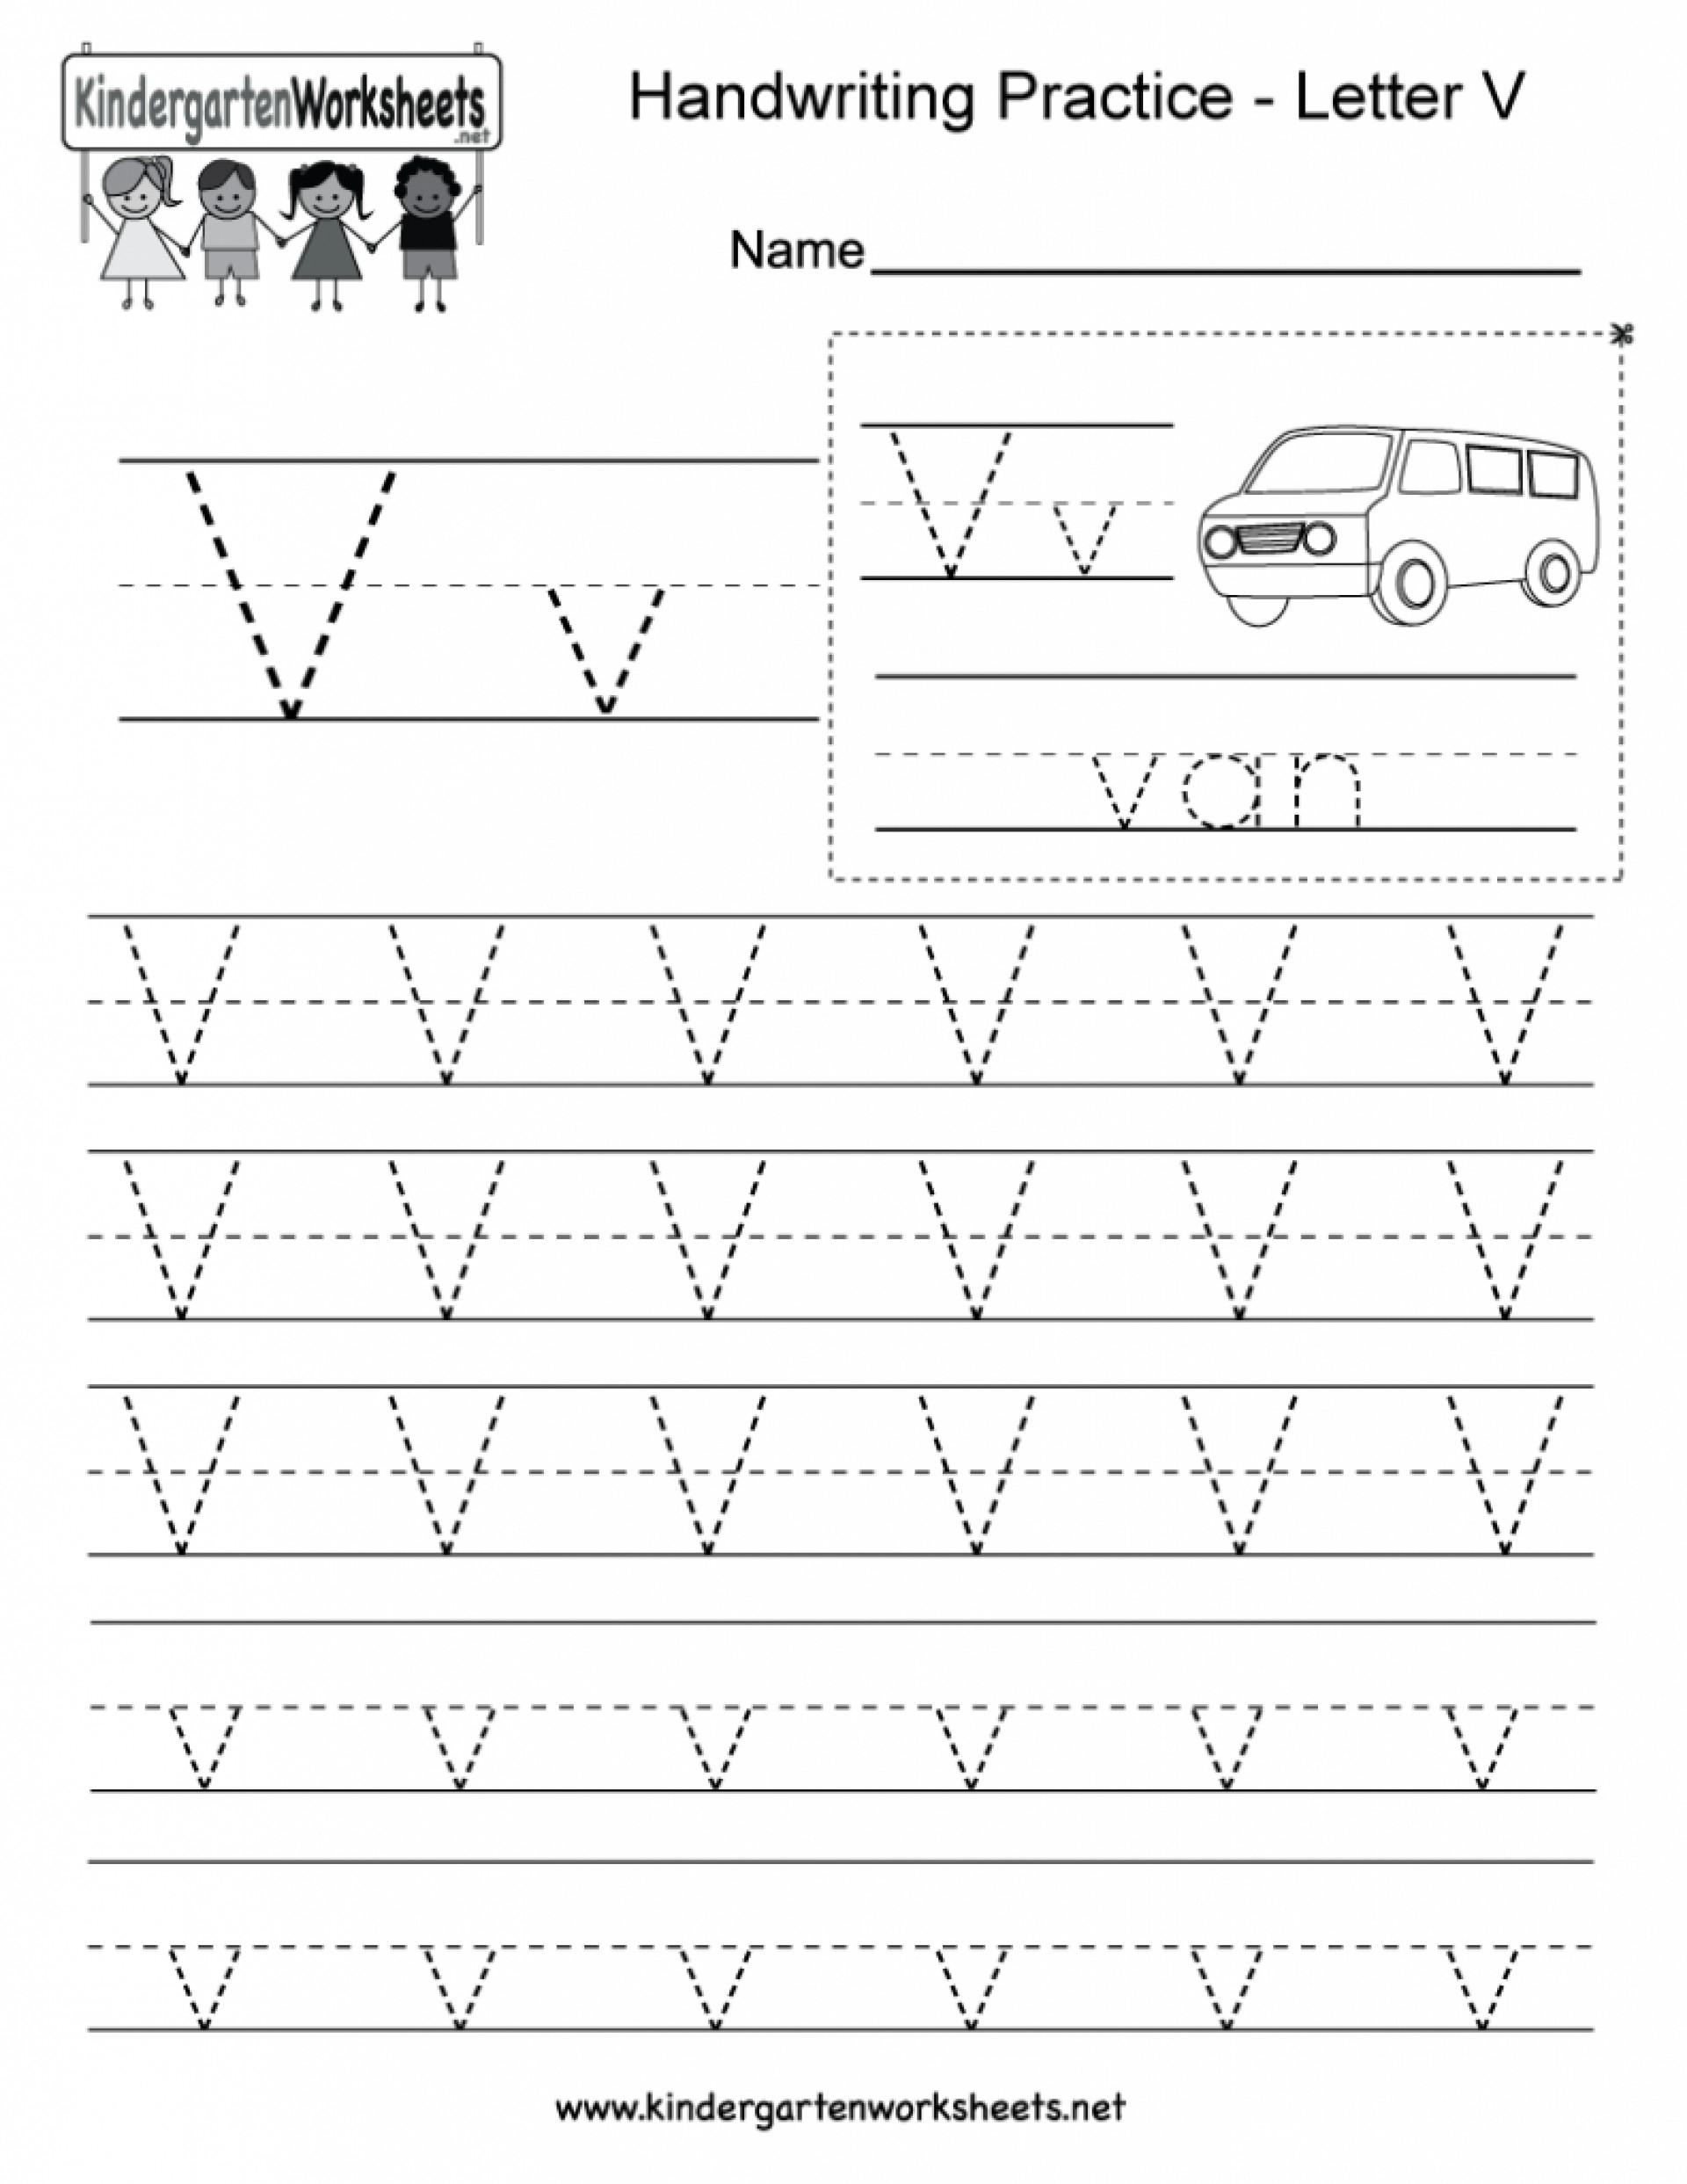 Handwriting Worksheets For Preschool Alphabet - Clover Hatunisi in Letter Y Worksheets For Prek